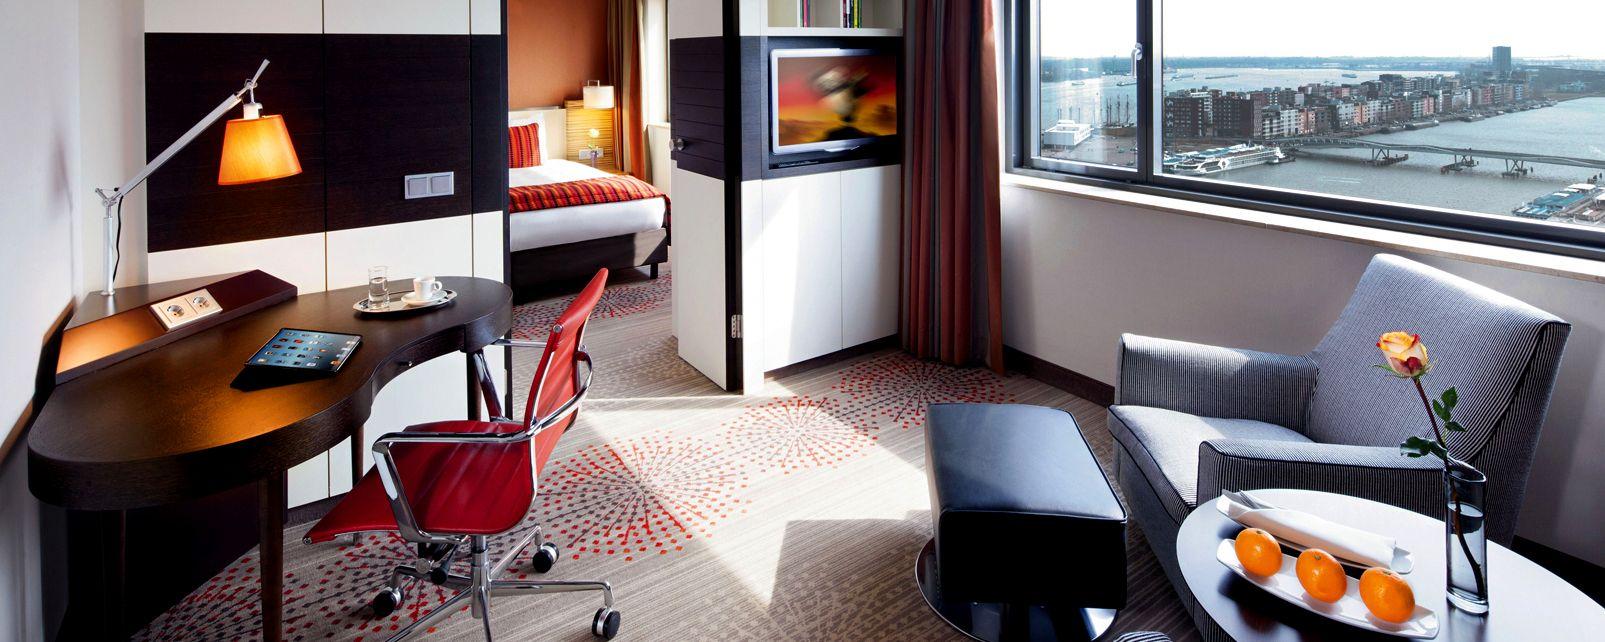 Hotel Movenpick